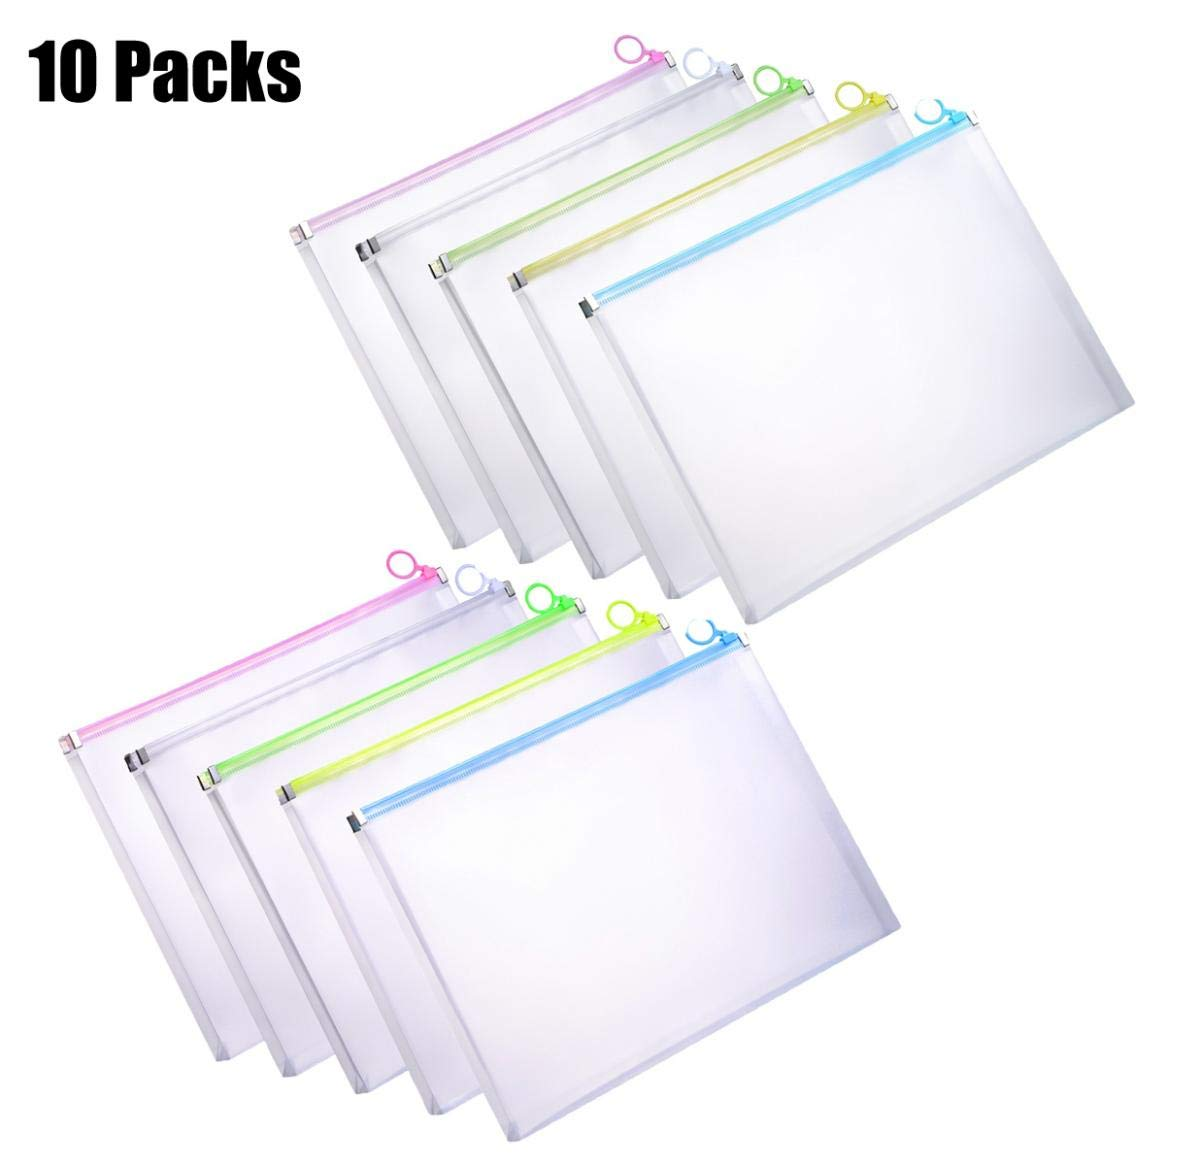 YoeeJob 10 PCS Translucent Poly Envelopes with Colored Zipper Closure,1 Inch Gusset Plastic Zip File Document Folder US Letter Size,Assorted